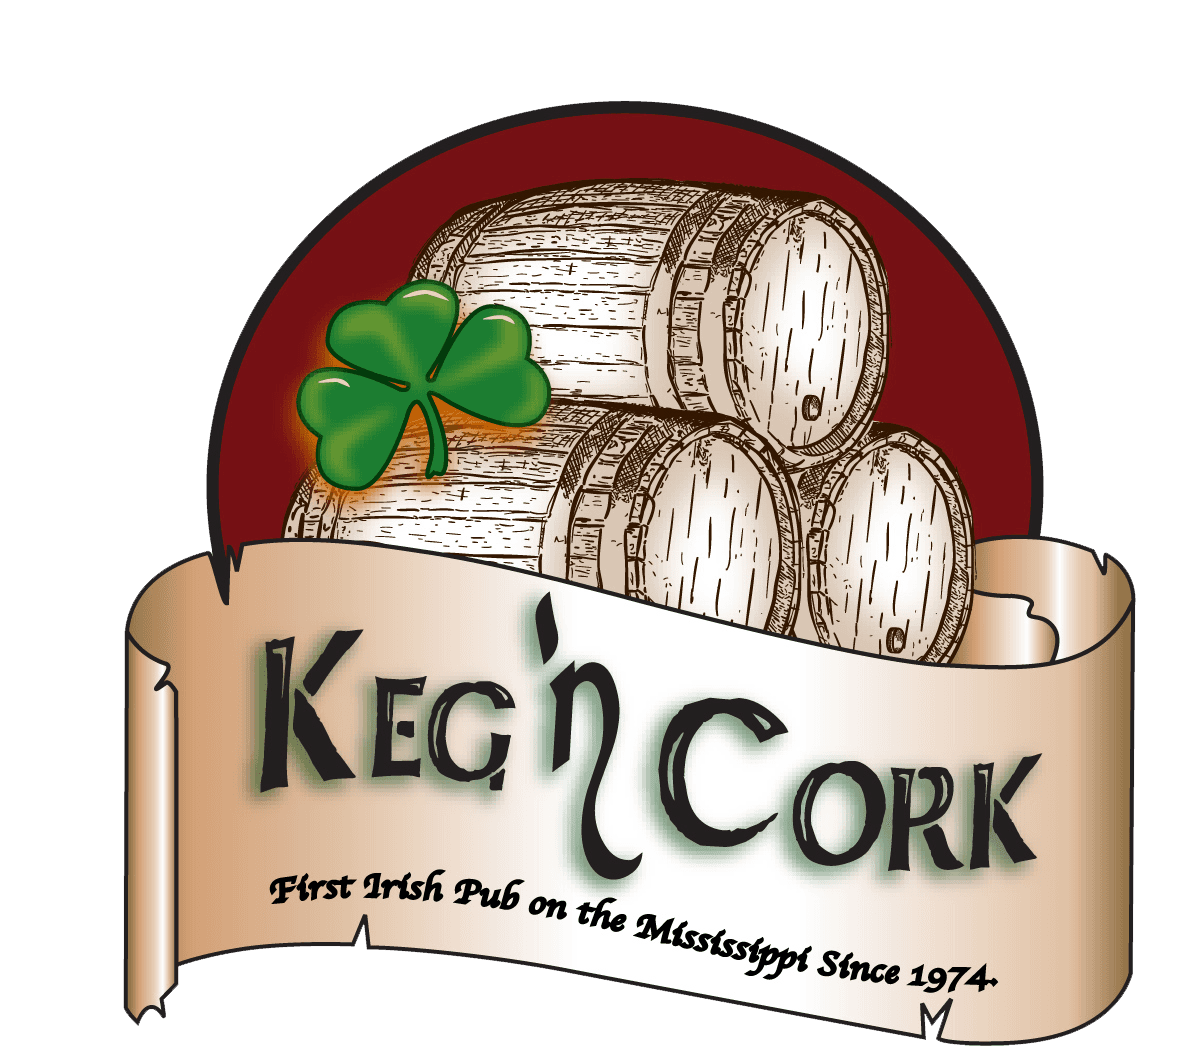 Keg n' Cork Logo